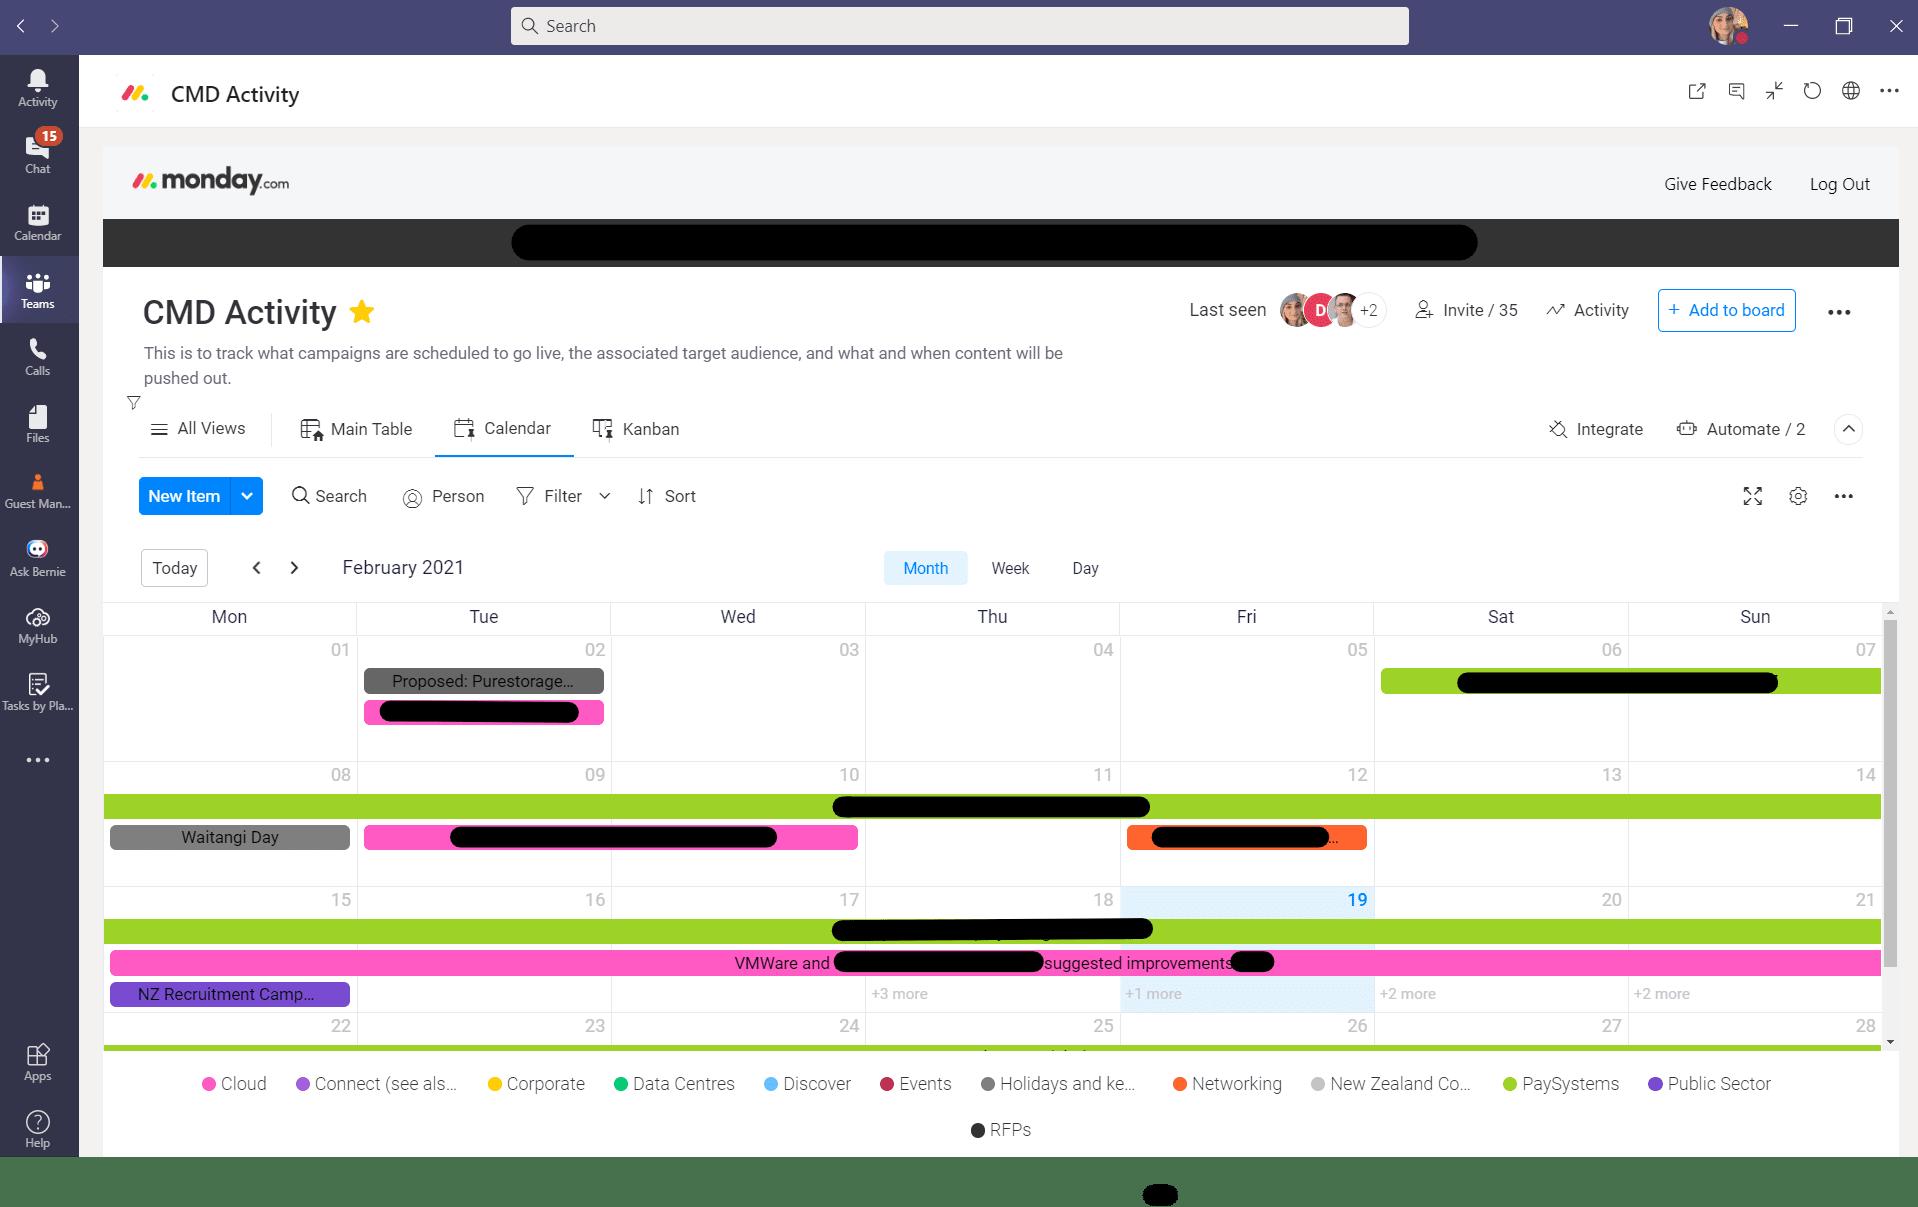 monday.com CMD Activity in teams Screenshot